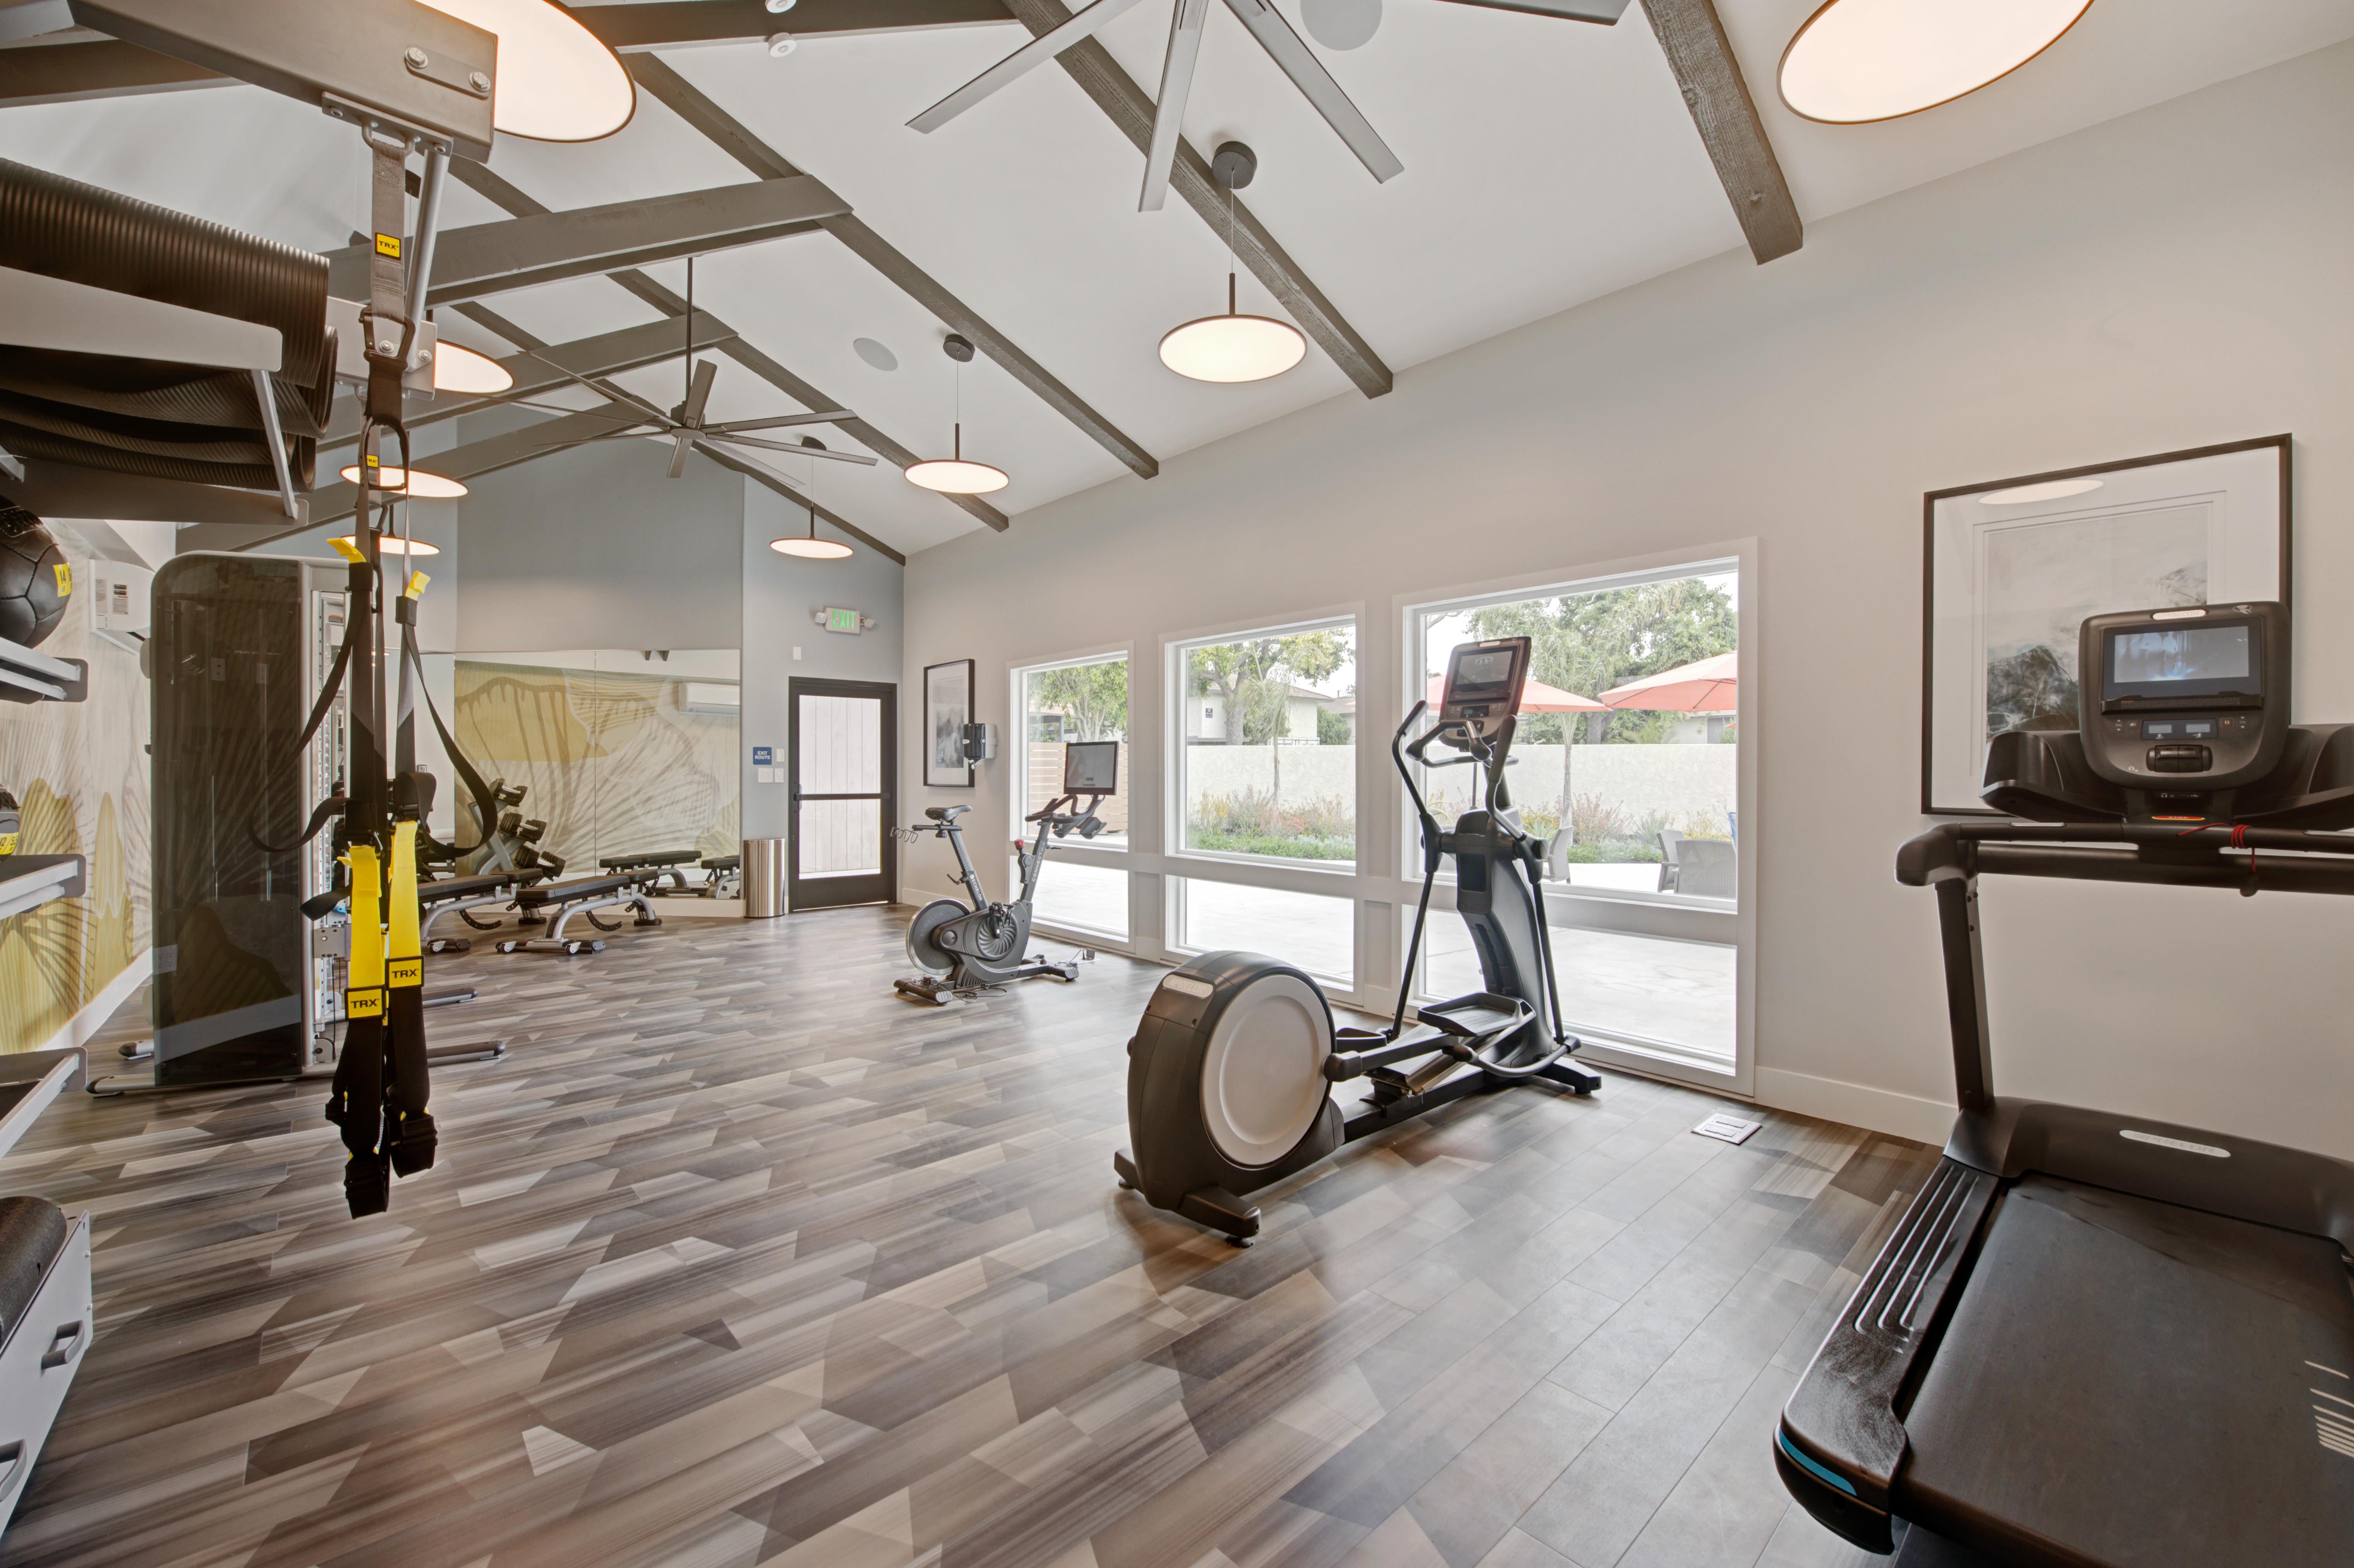 Fitness center with cycle equipment at Sofi Ventura in Ventura, California